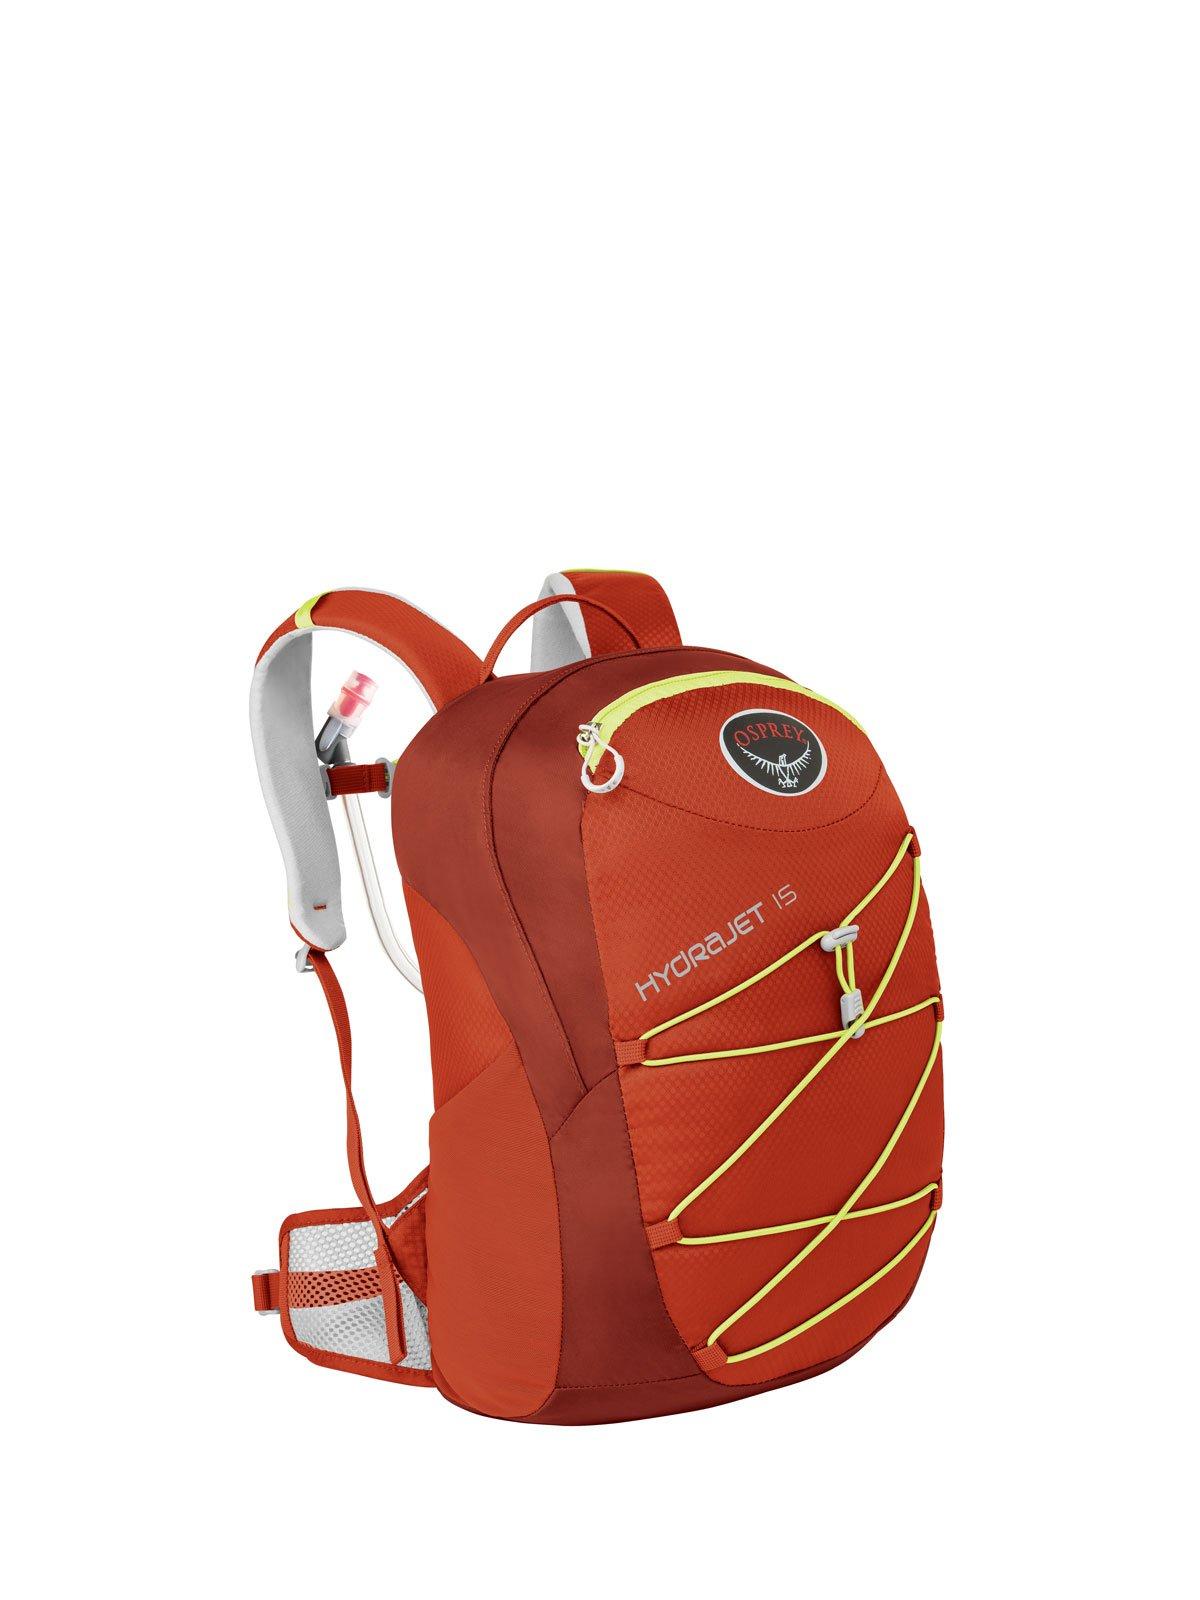 Osprey Packs HydraJet 15 Kid's Hydration Pack, Strawberry Red